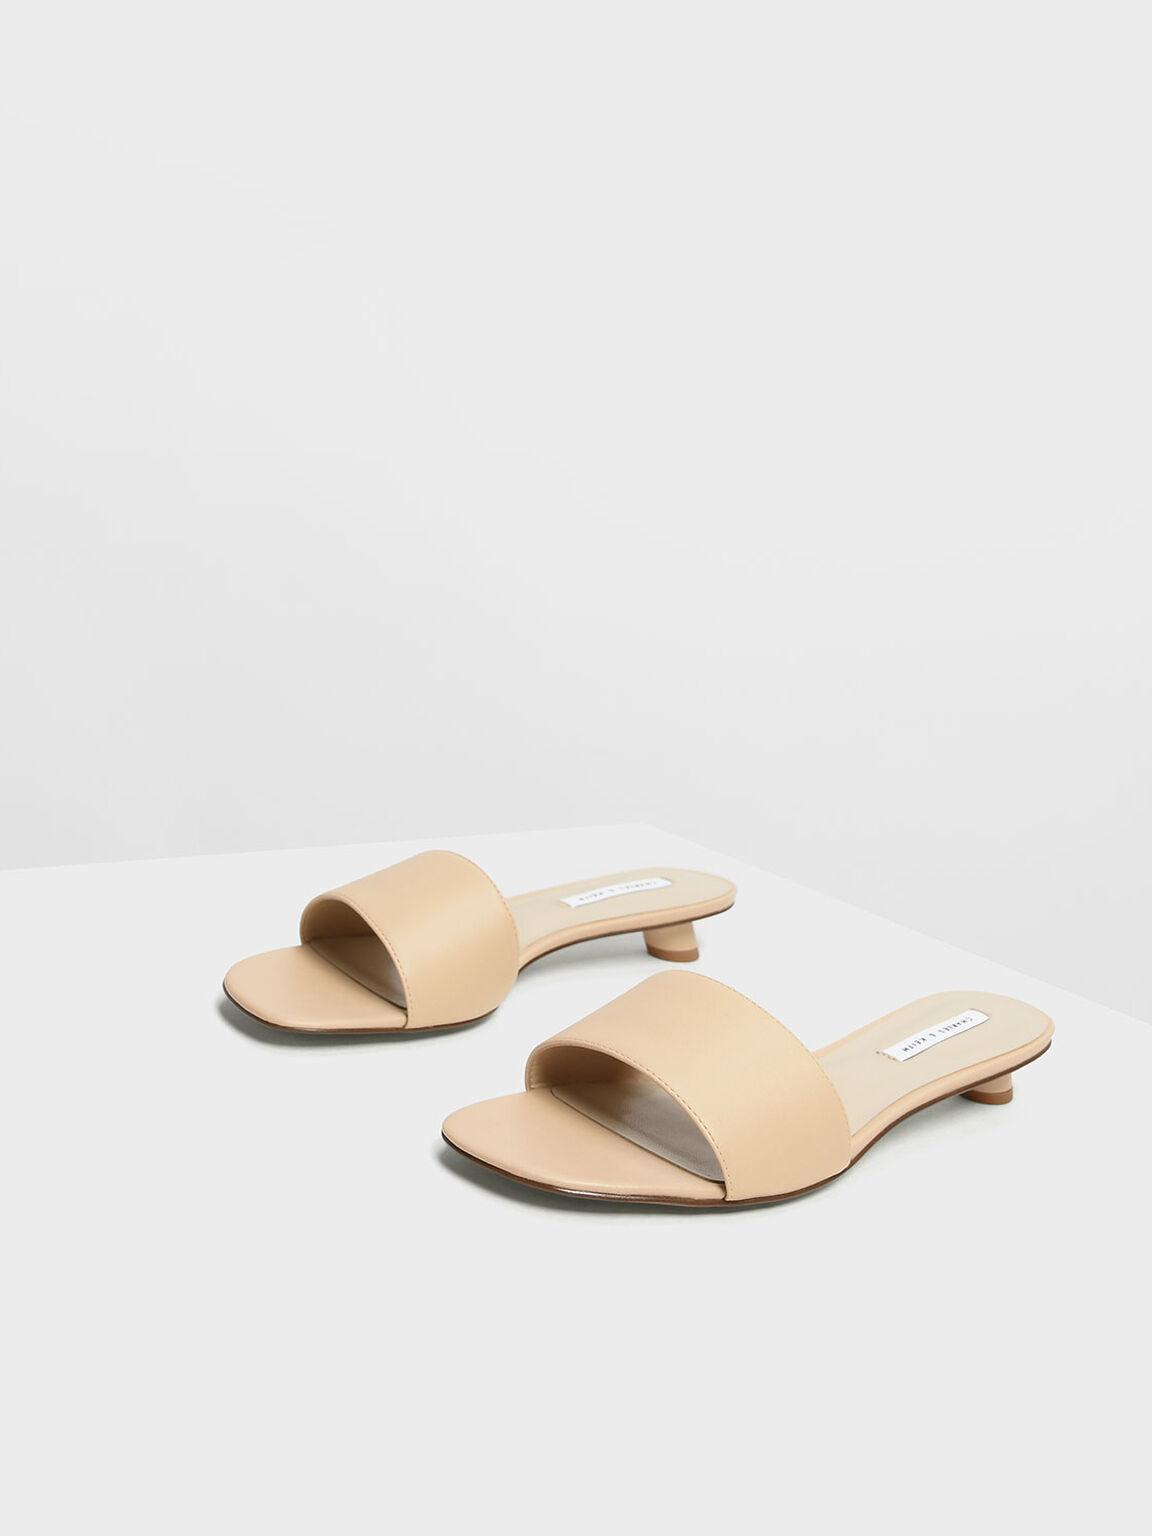 Classic Heeled Slide Sandals, Nude, hi-res